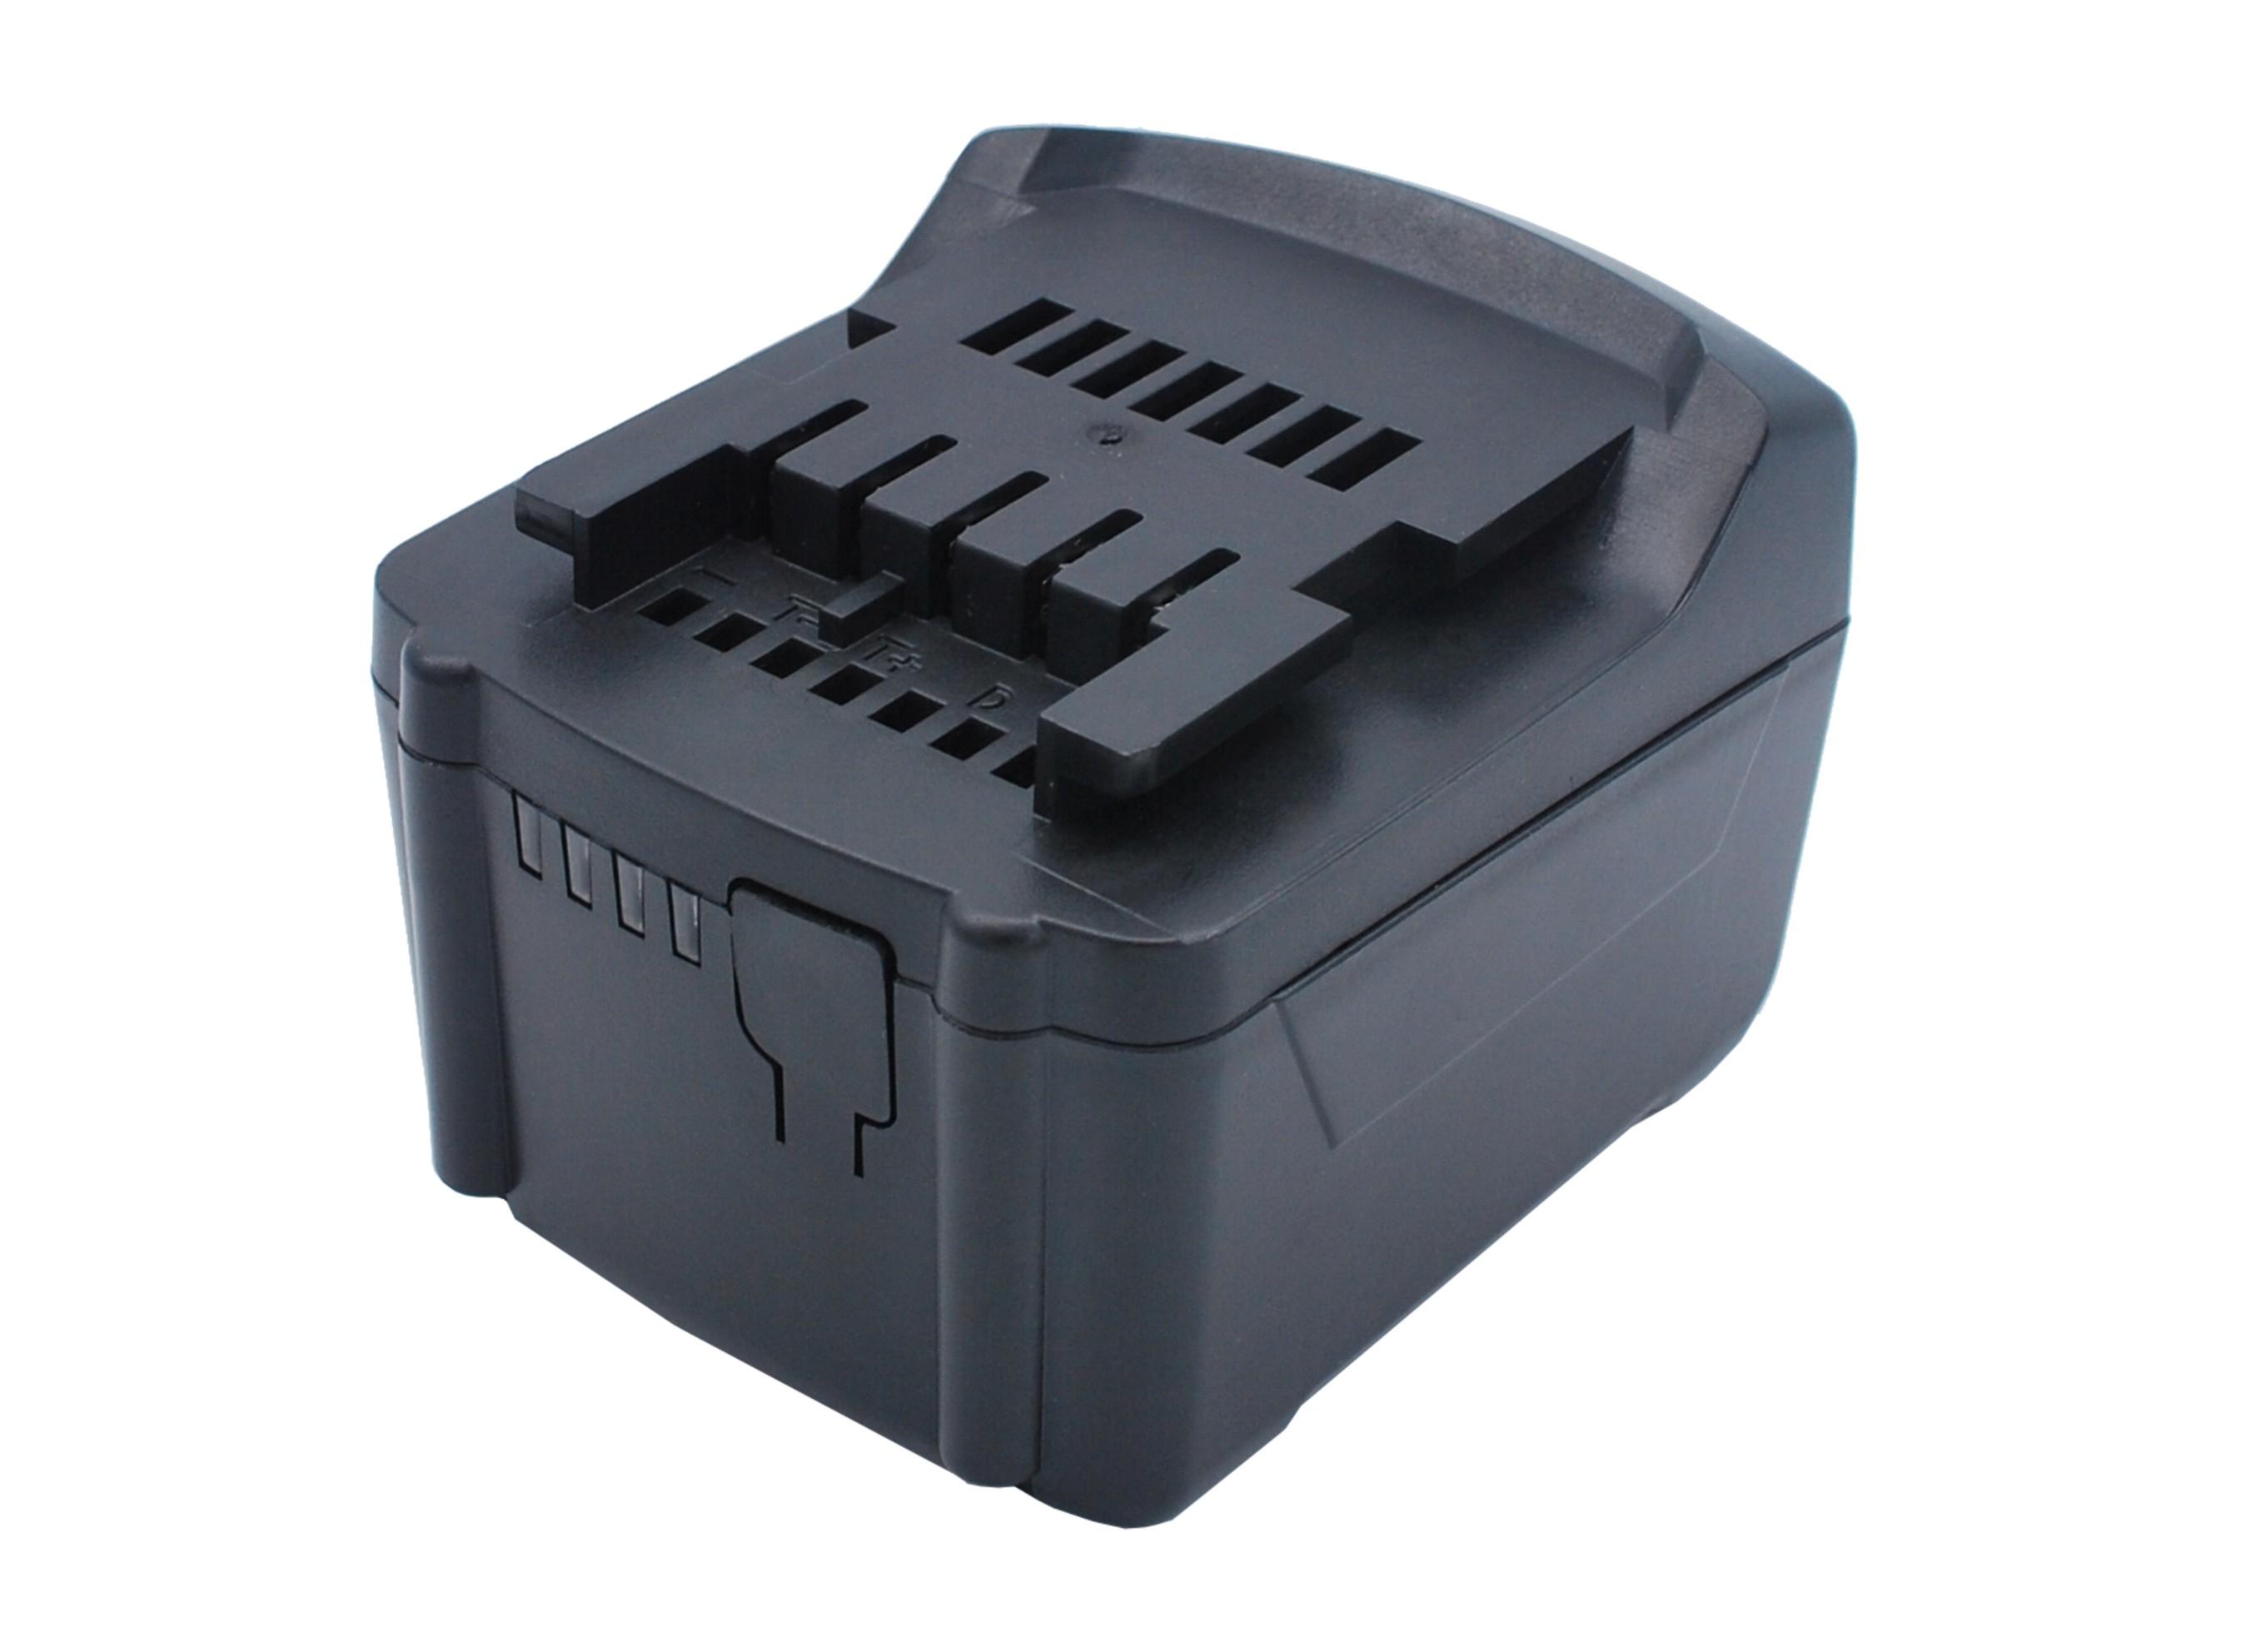 Cameron Sino baterie do nářadí pro METABO BS 14.4 LTX Impuls 6.02143.61 14.4V Li-ion 5000mAh černá - neoriginální